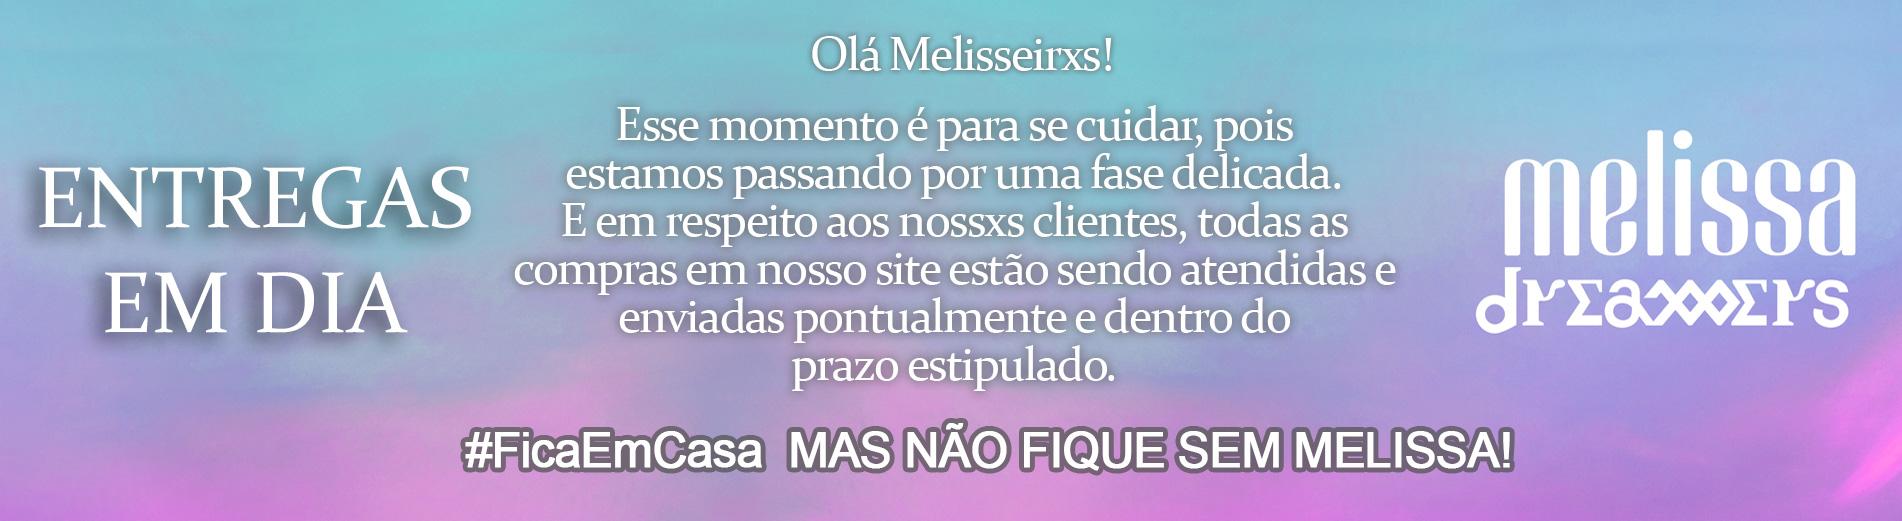 Melissa Dreamers